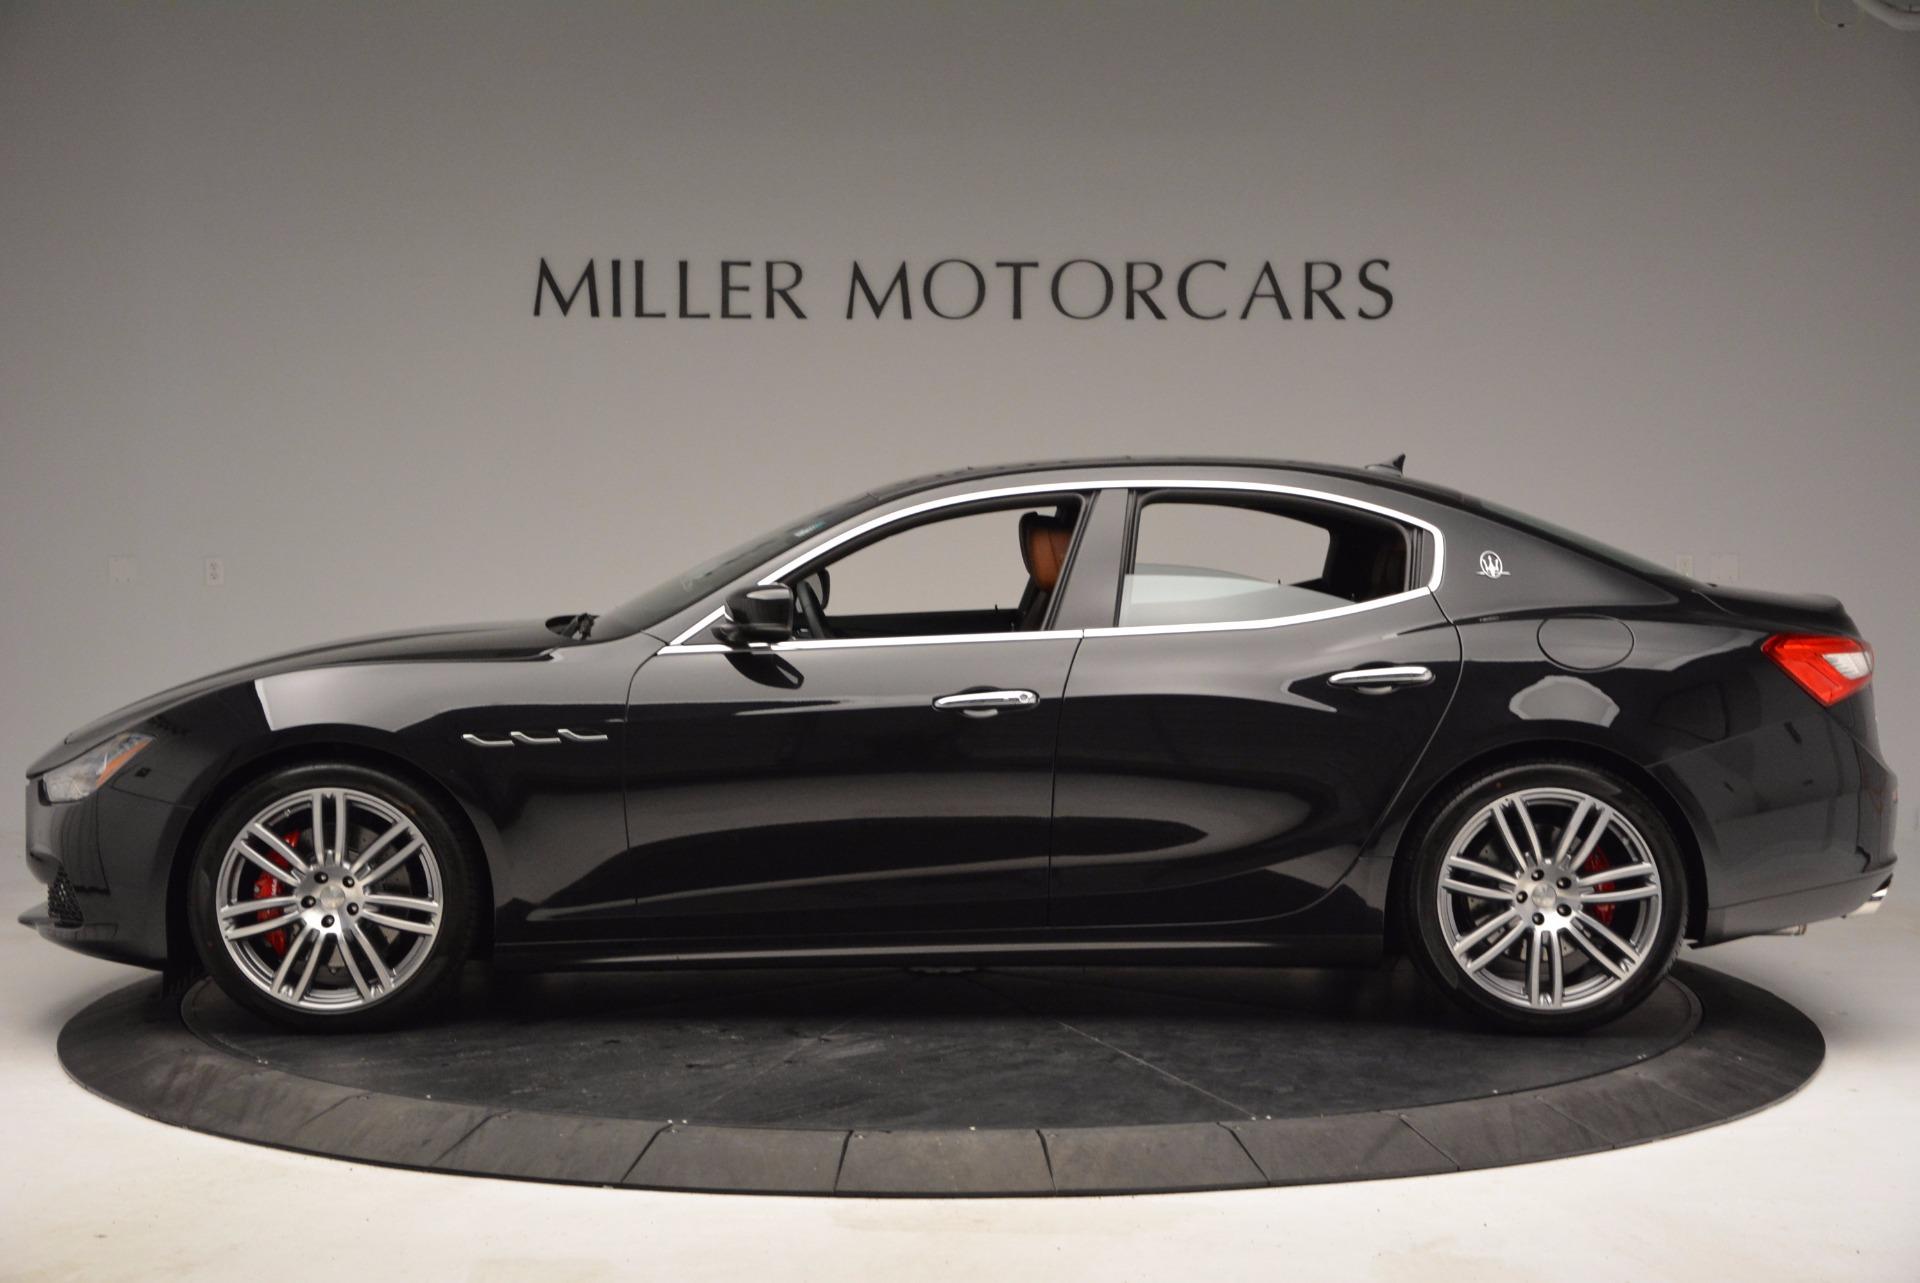 Used 2014 Maserati Ghibli S Q4 For Sale In Greenwich, CT. Alfa Romeo of Greenwich, 7249 1459_p3